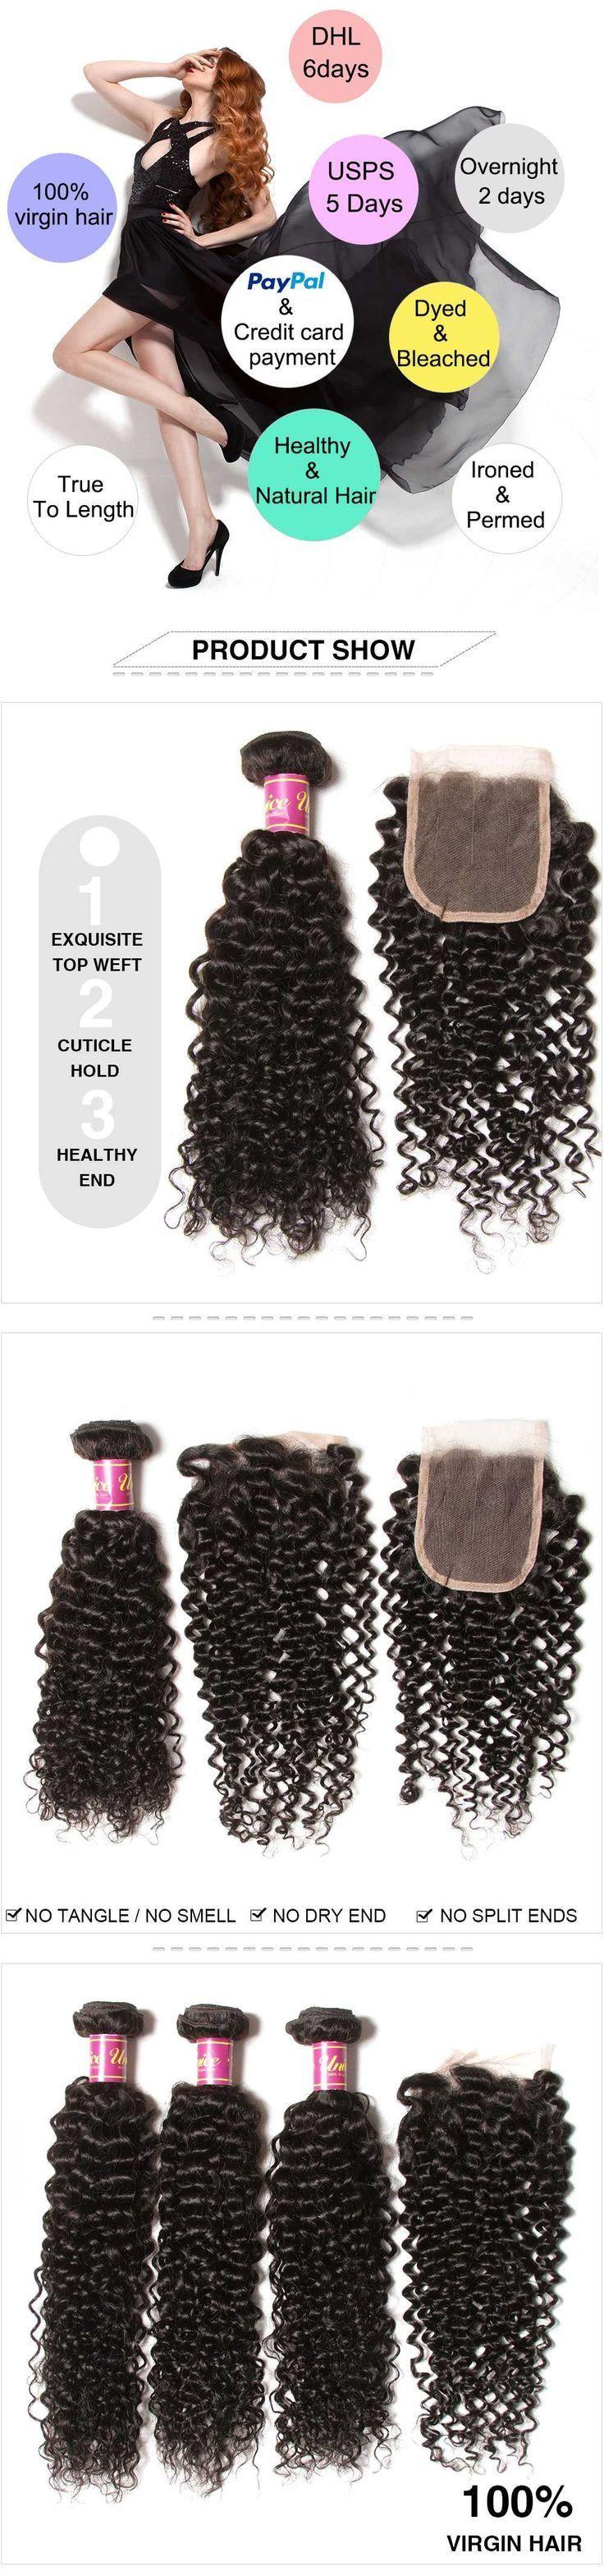 Hair Icenu Series 4Pcs Malaysian Jerry Curly Hair …